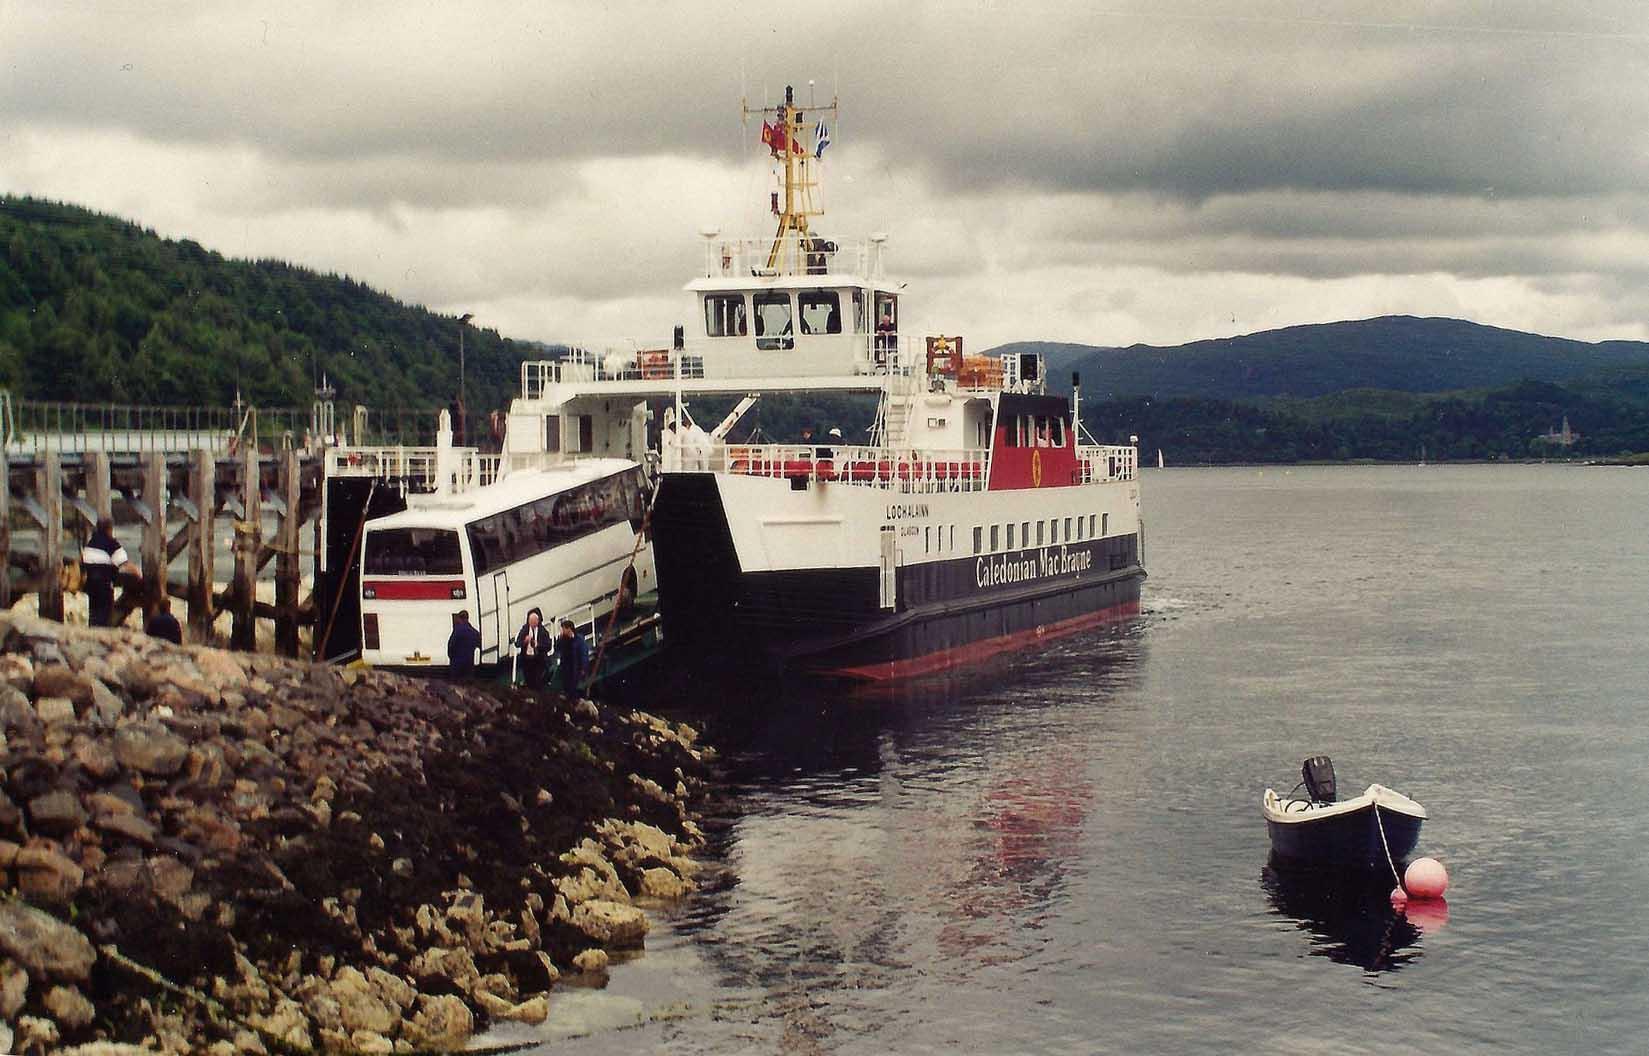 Loch Alainn on berthing trials at Lochaline (Iain McPherson)